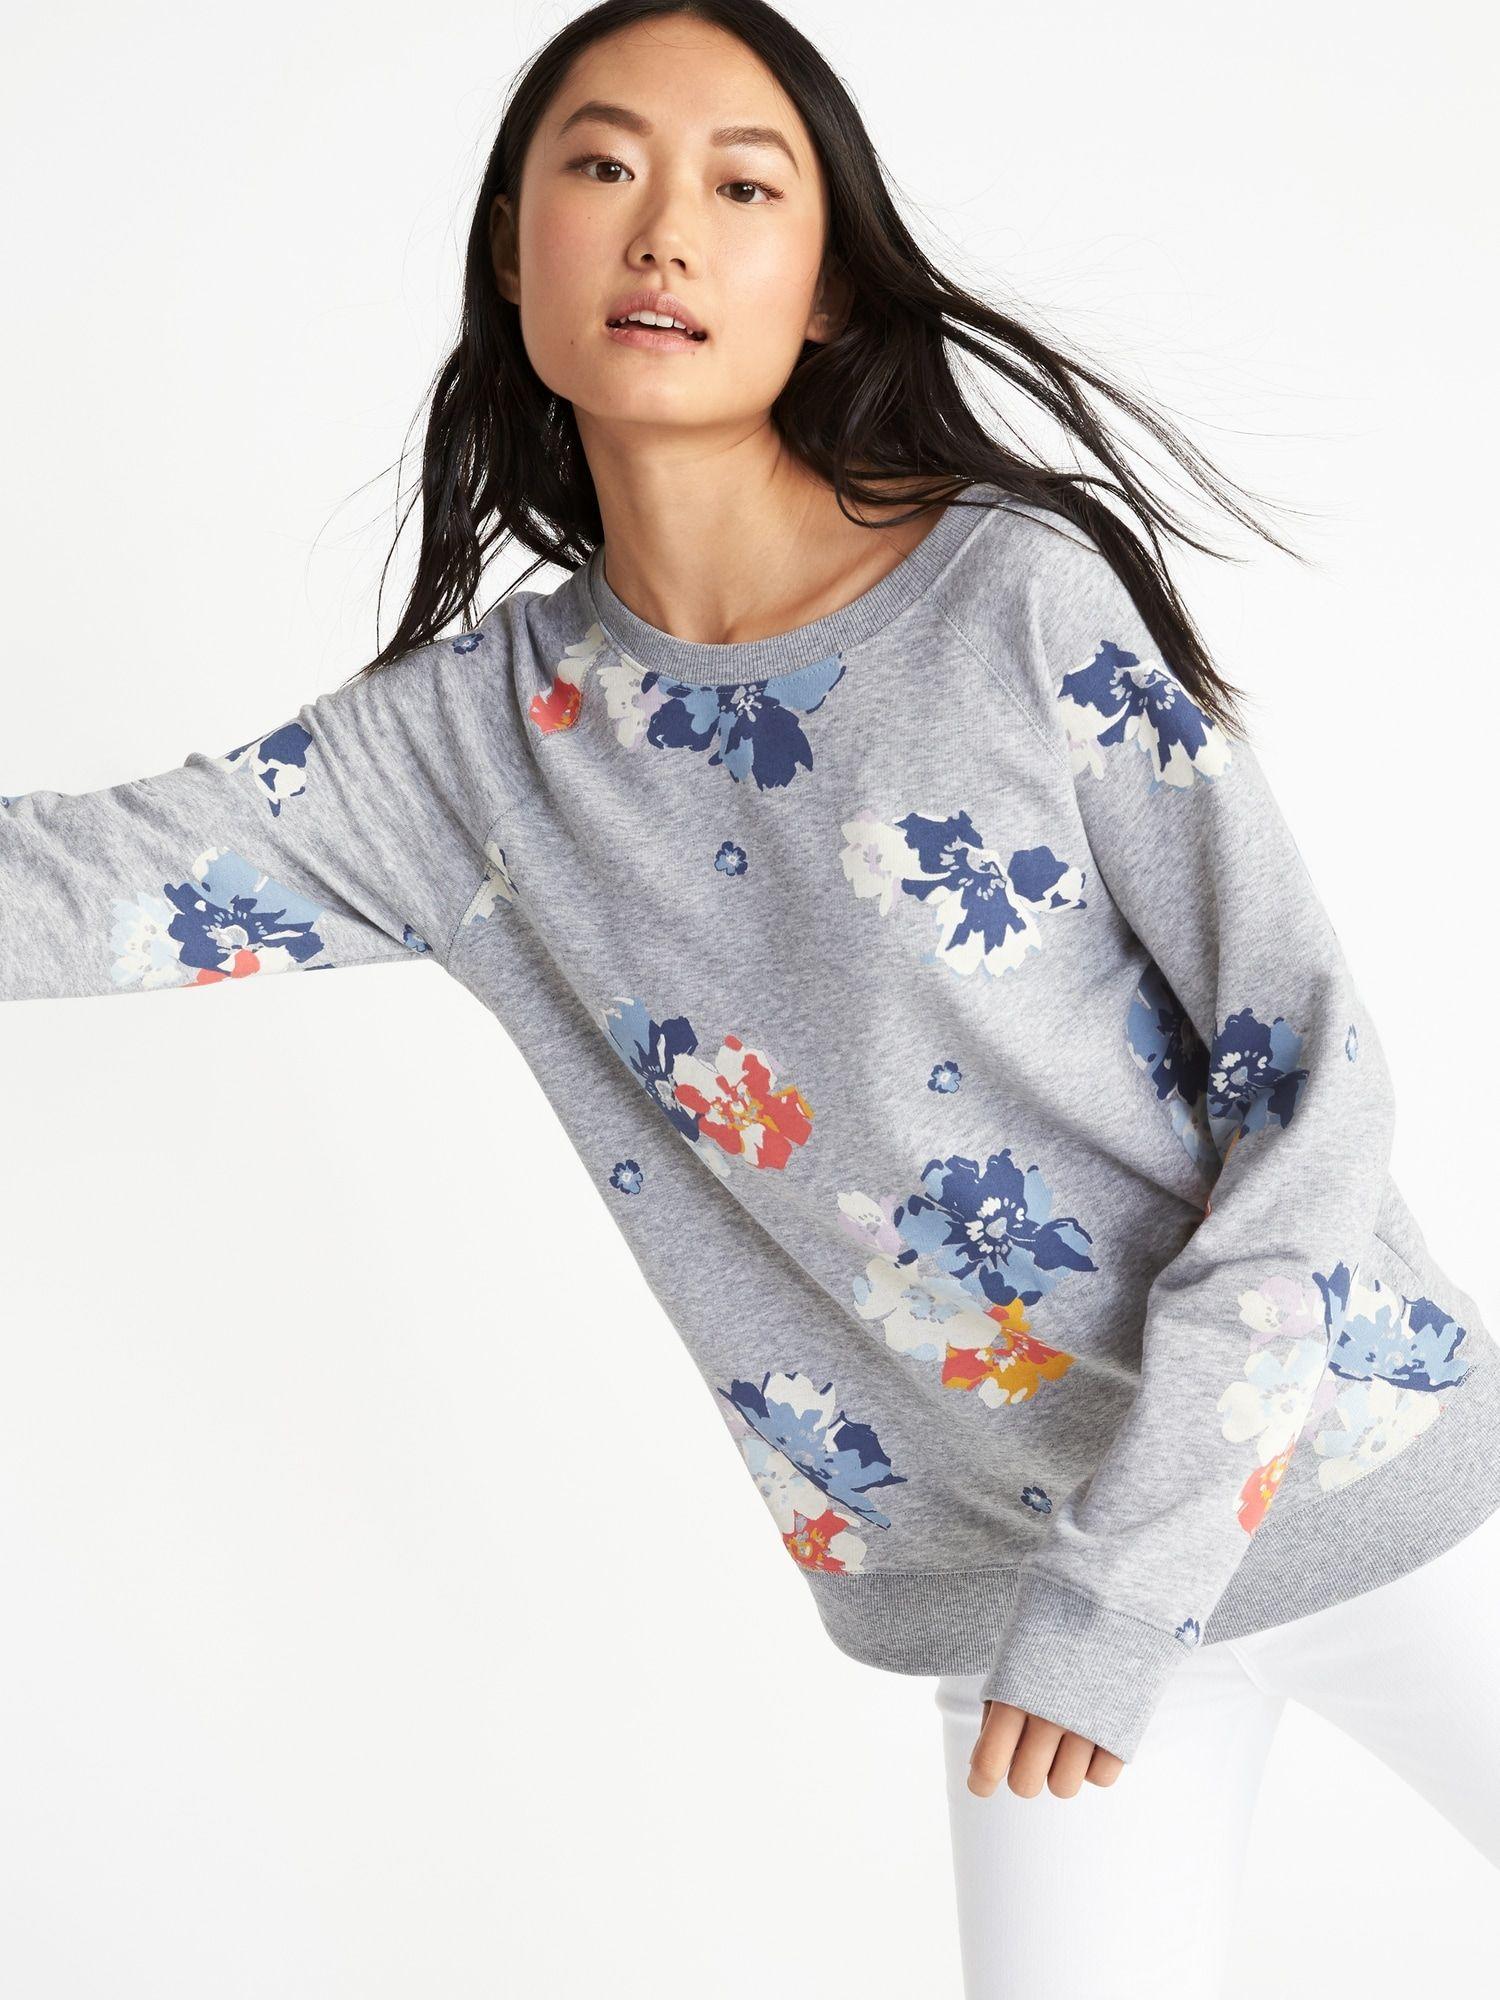 b71595ccf19863 Relaxed Vintage Fleece Sweatshirt for Women